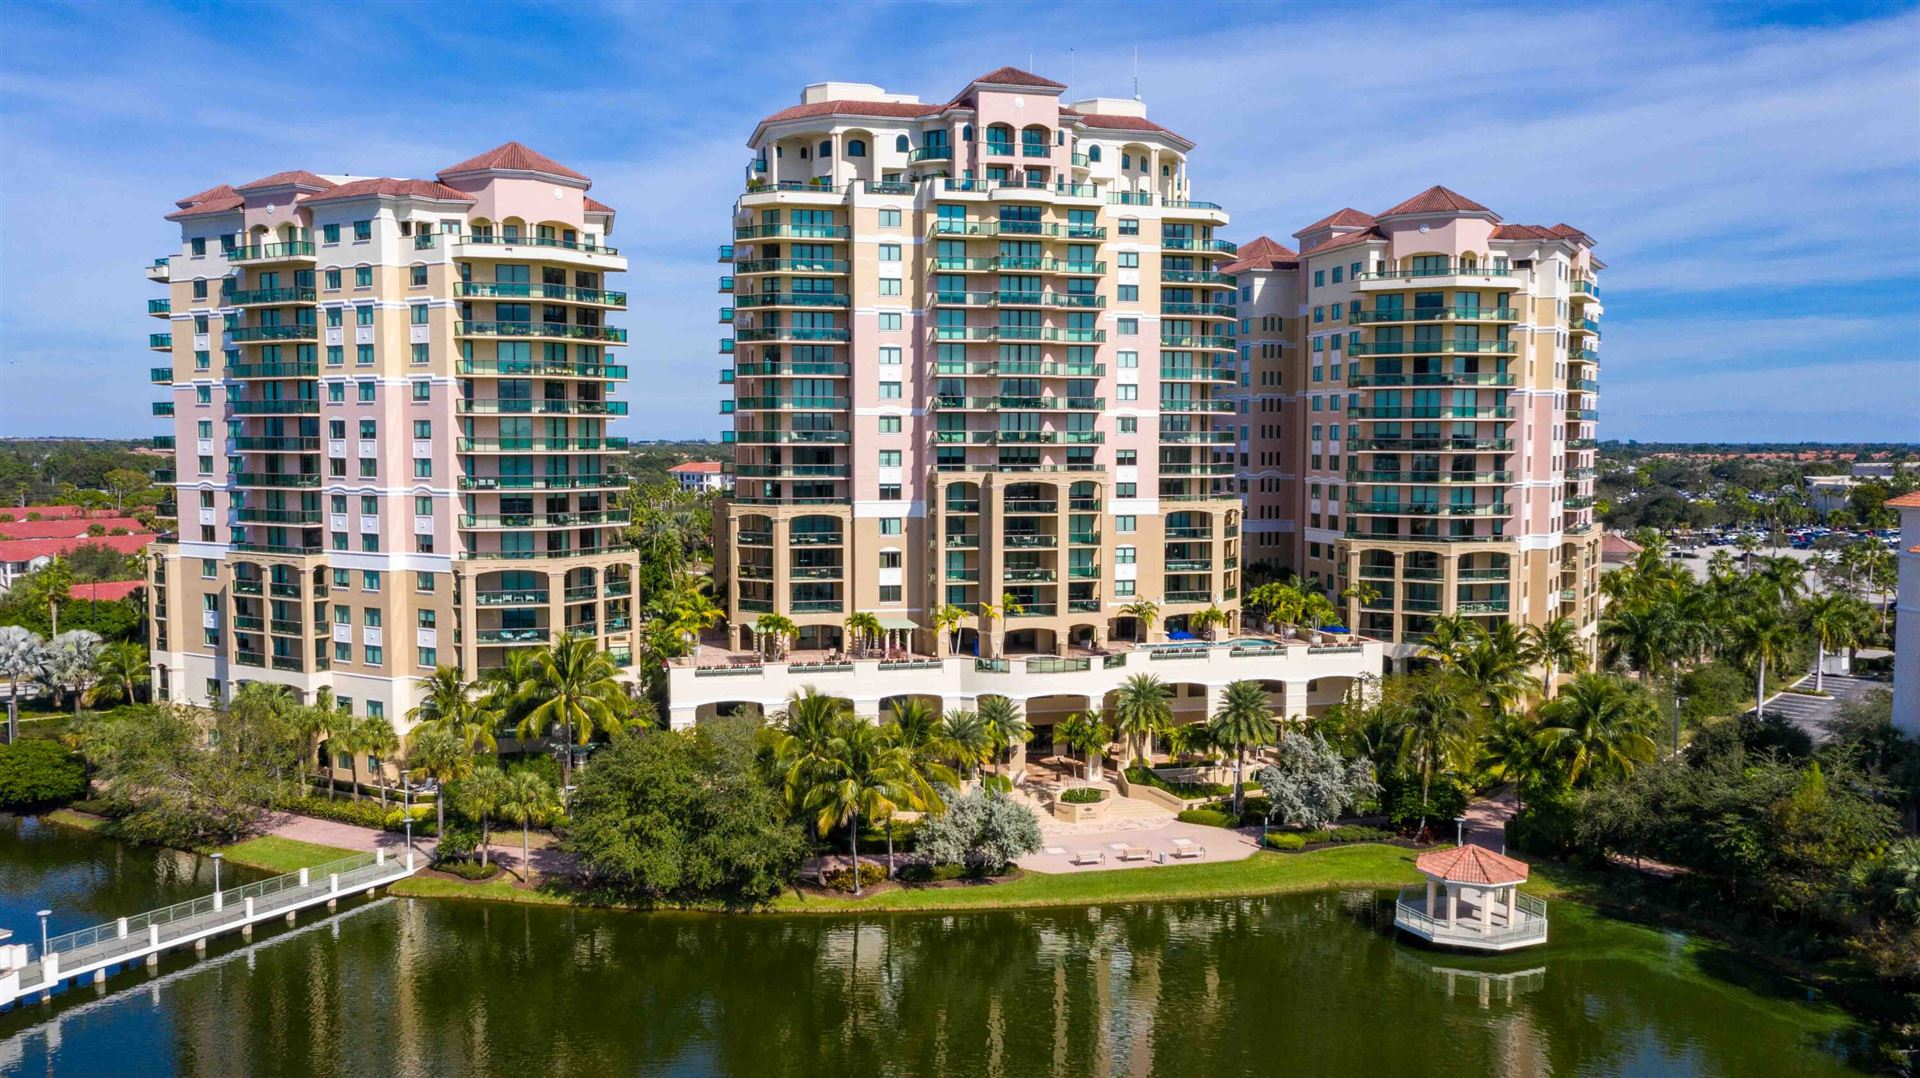 3630 Gardens Parkway #803c, Palm Beach Gardens, FL 33410 - MLS#: RX-10751748